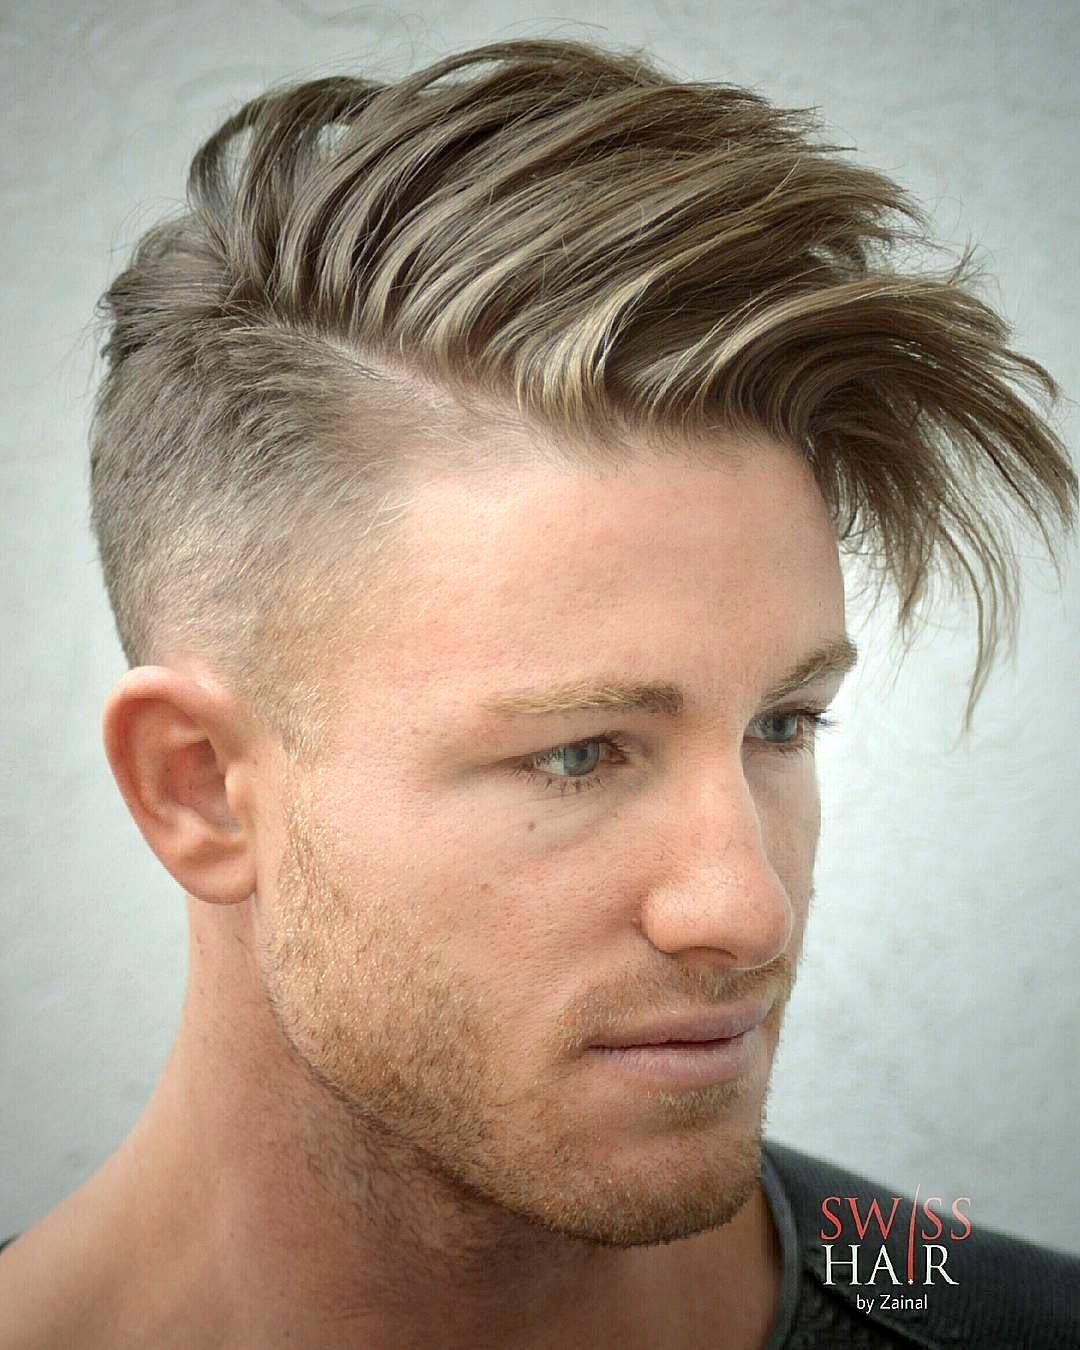 Jungs frisuren oben lang unten kurz – Beliebte Frisuren 11